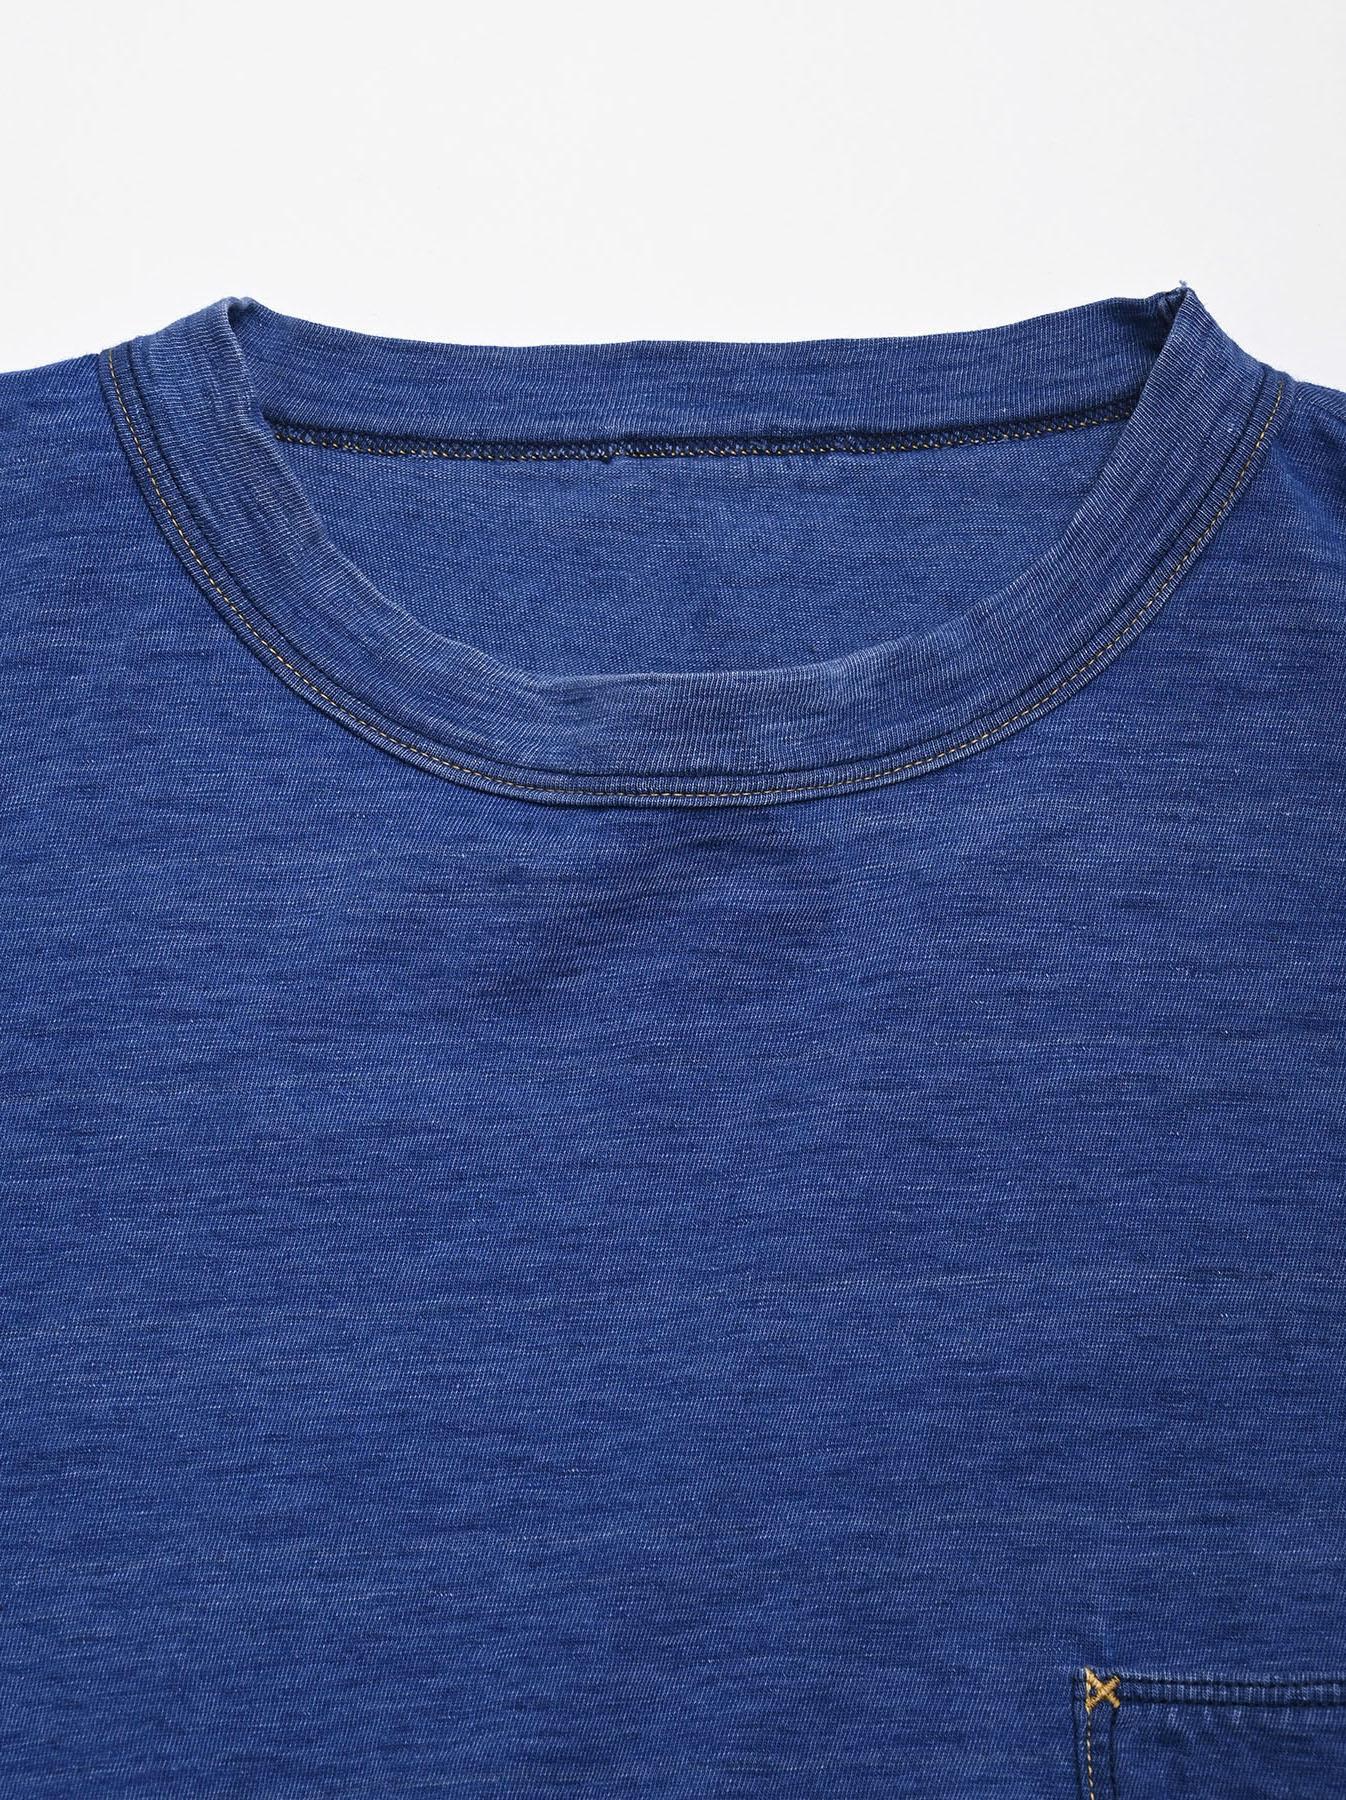 Distressed Indigo Tenjiku 908 Ocean T-Shirt (0621)-12